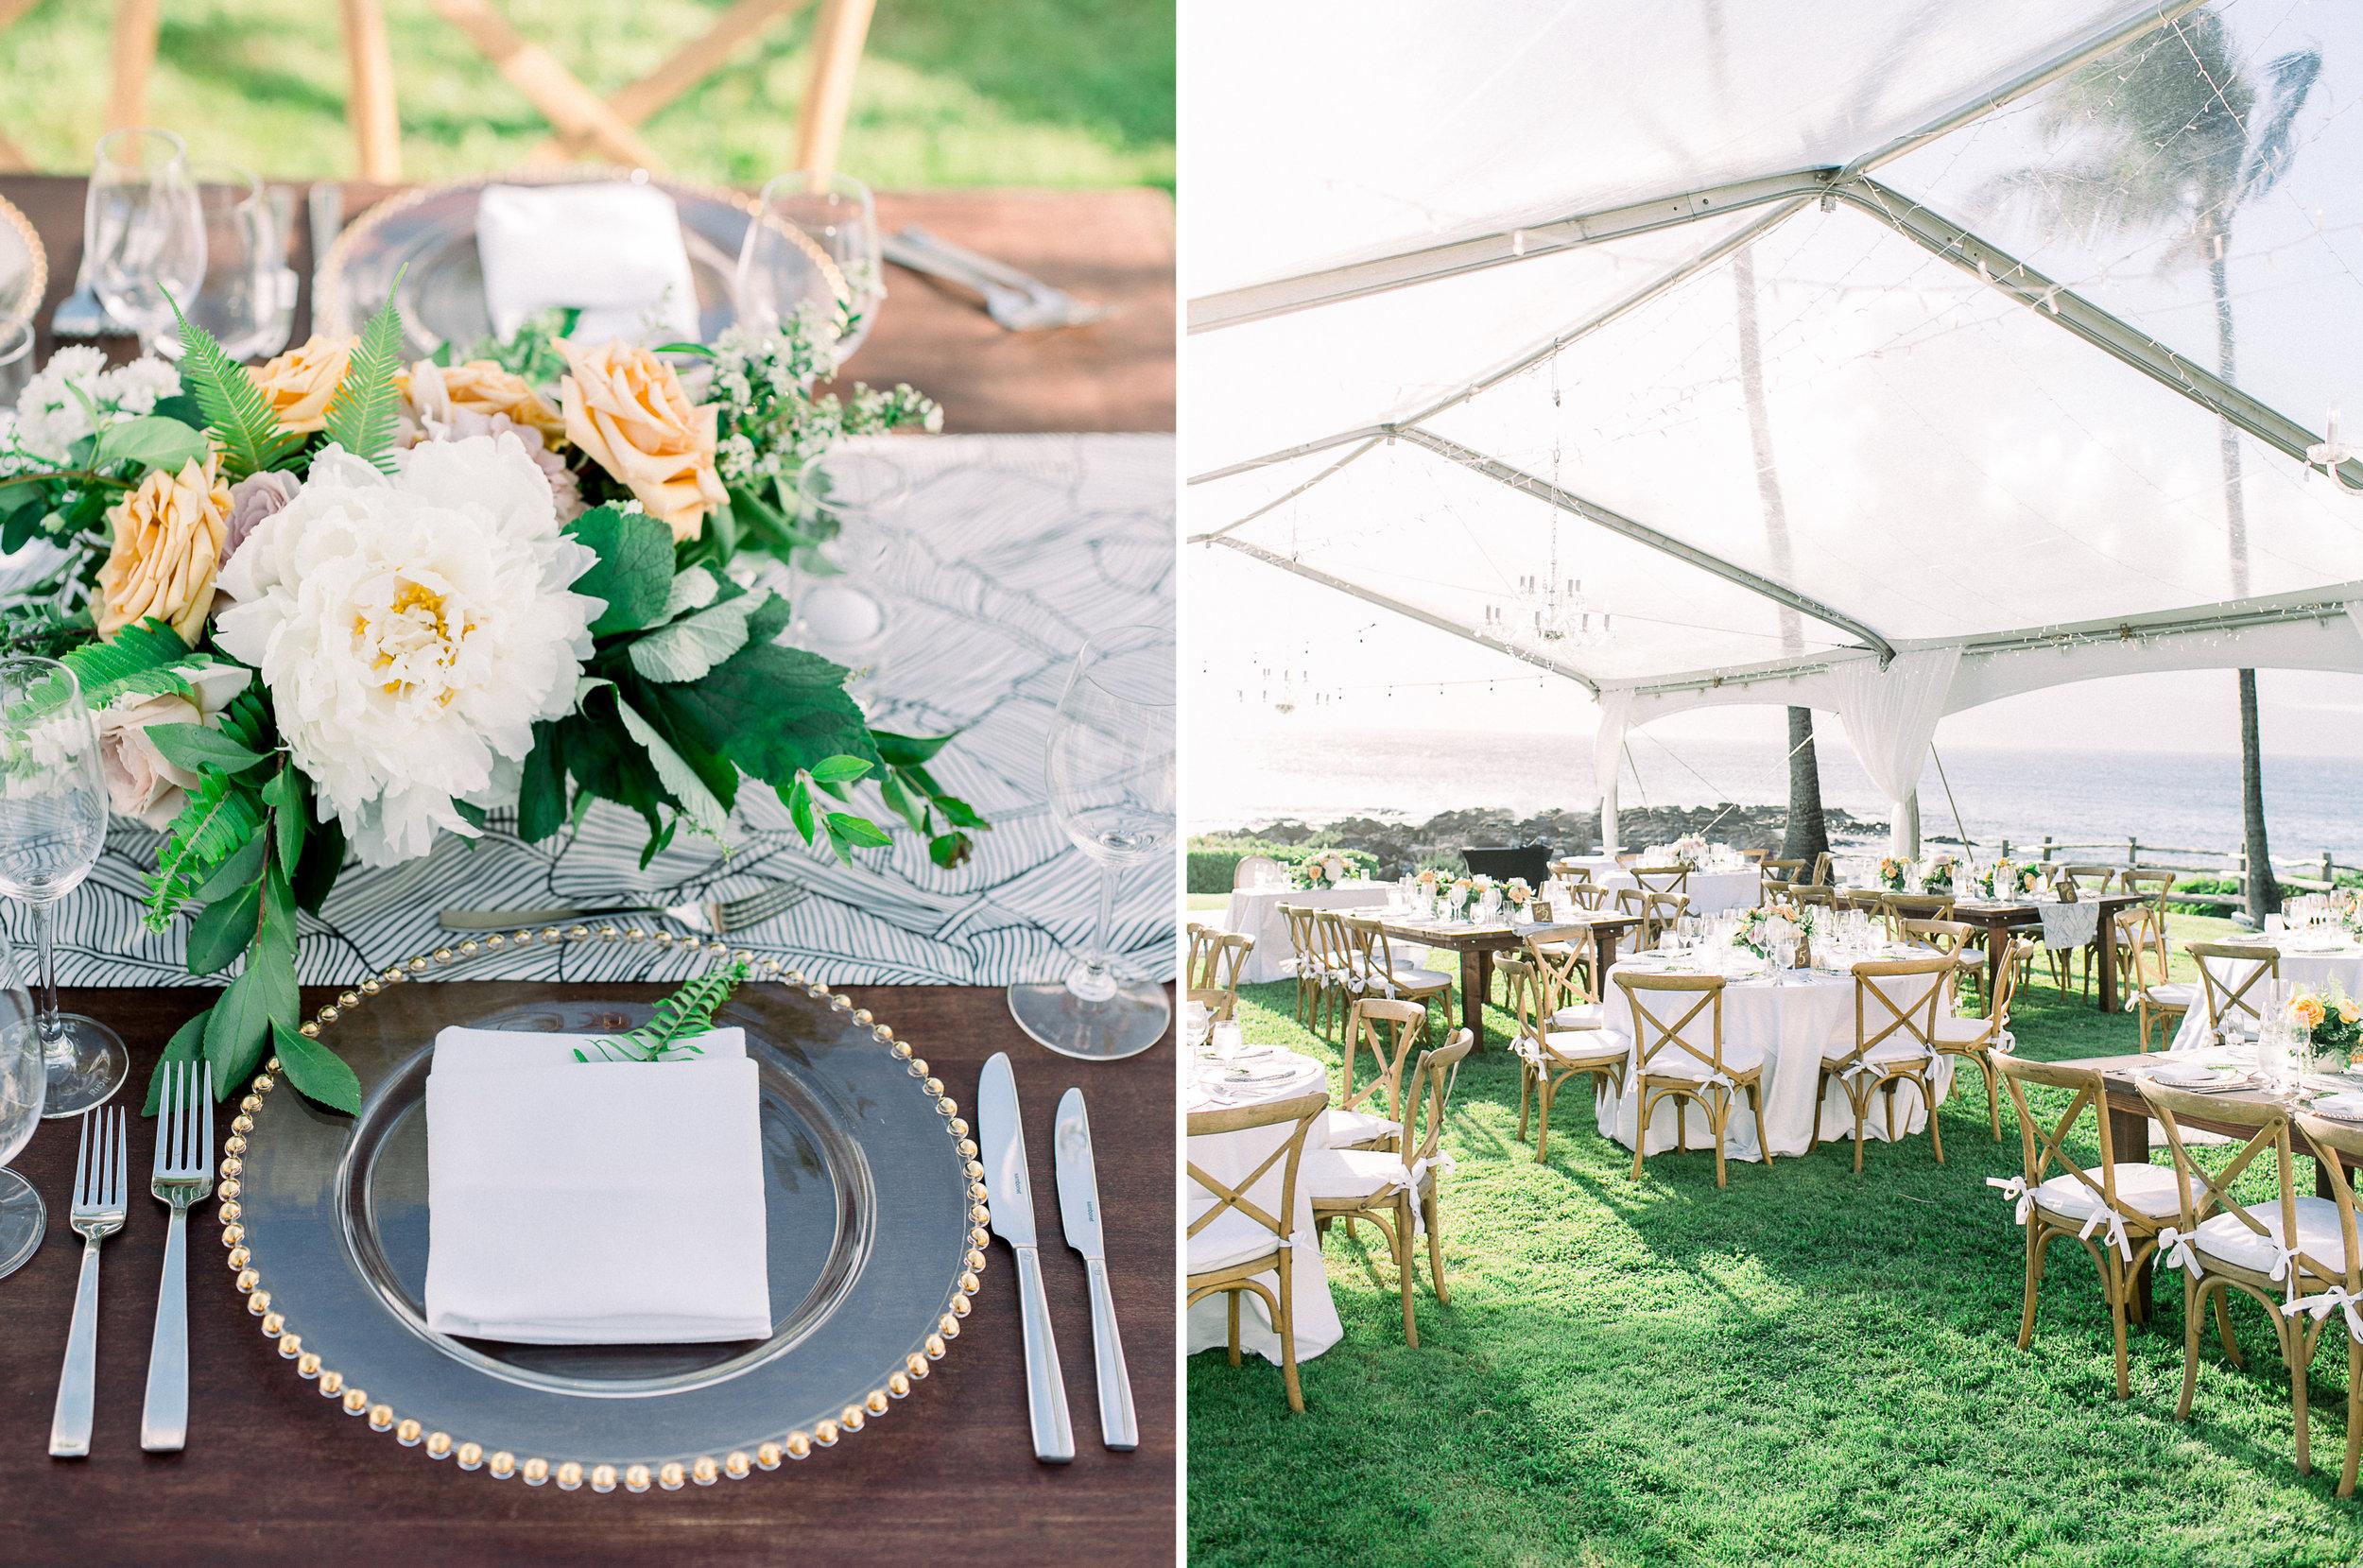 Maui-Fine-Art-Wedding-Photographer-22.JPG